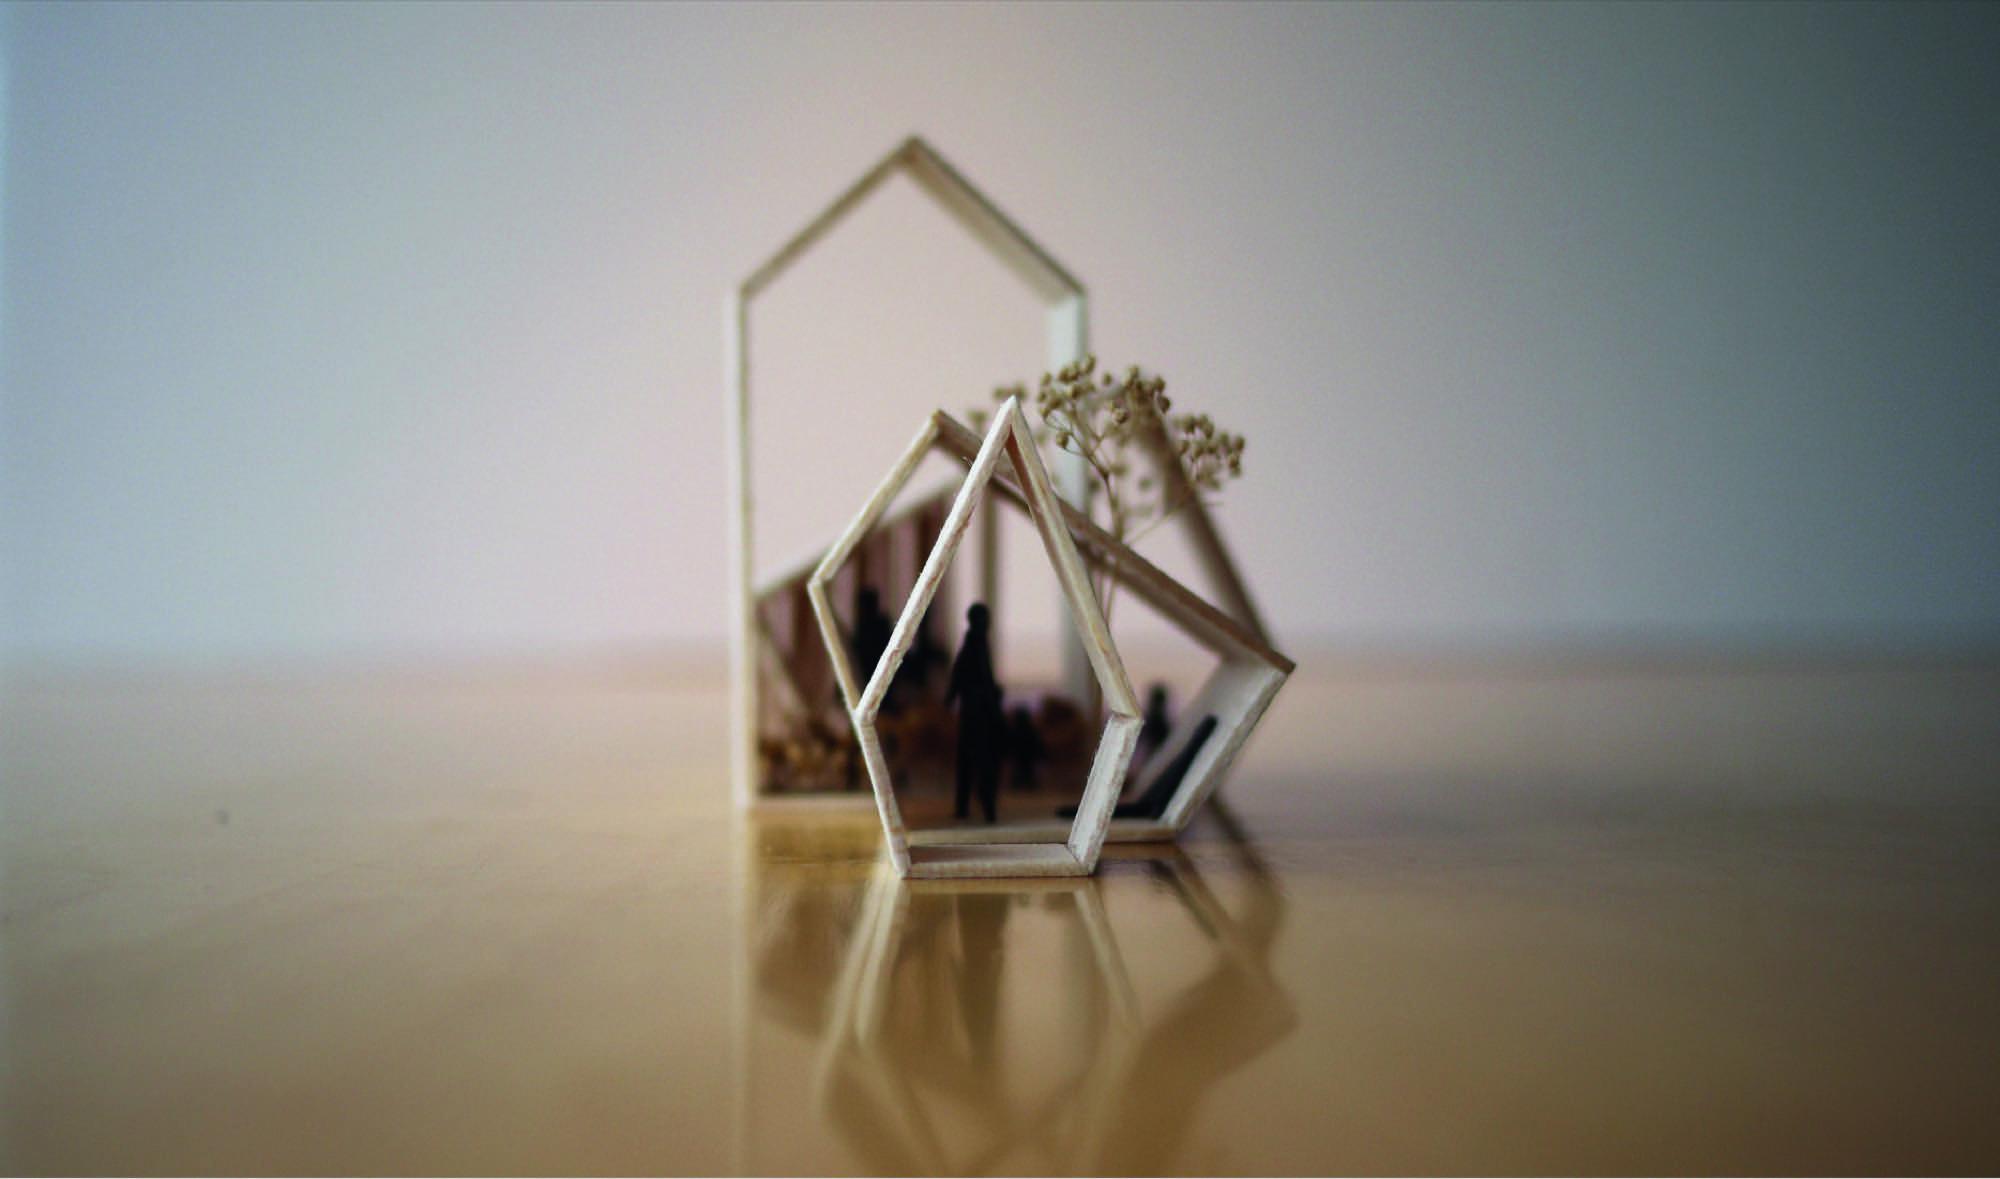 Jardins M - maquette 2